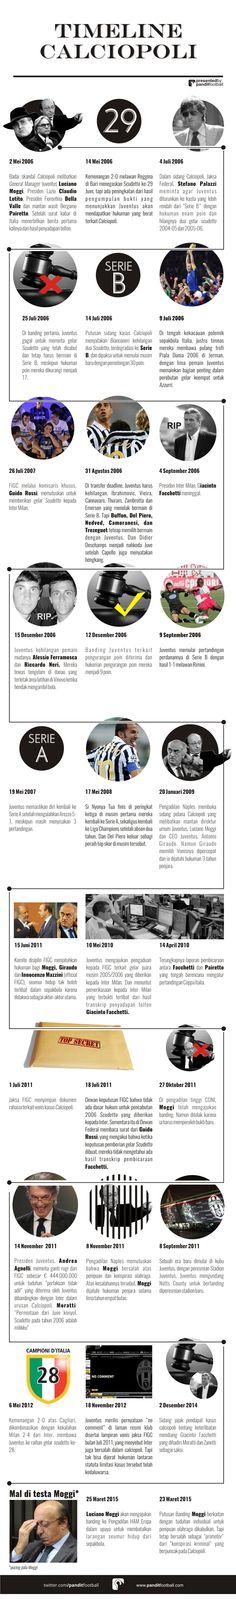 Perjalanan Panjang Luciano Moggi yang Belum Selesai  http://panditfootball.com/?p=174941